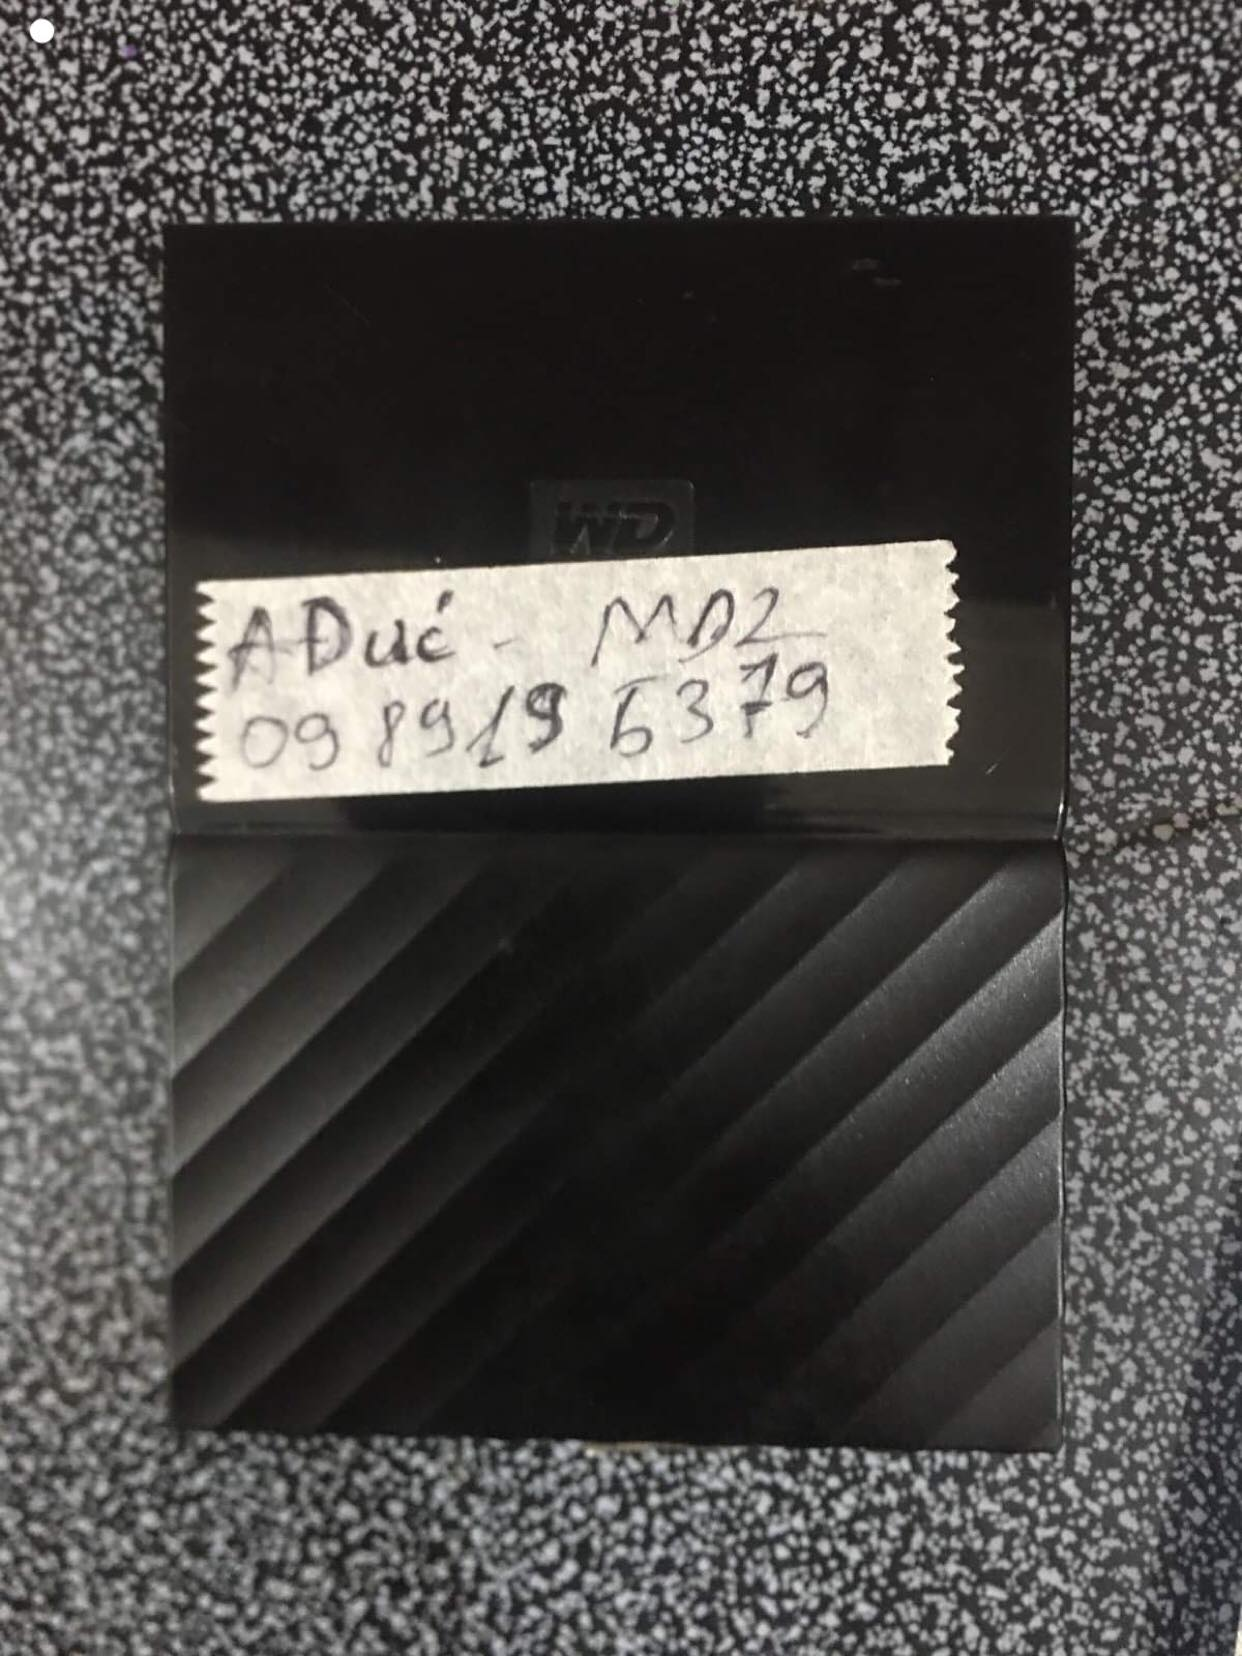 Cứu dữ liệu ổ cứng Western 1TB mất dữ liệu 04/07/2019 - cuumaytinh